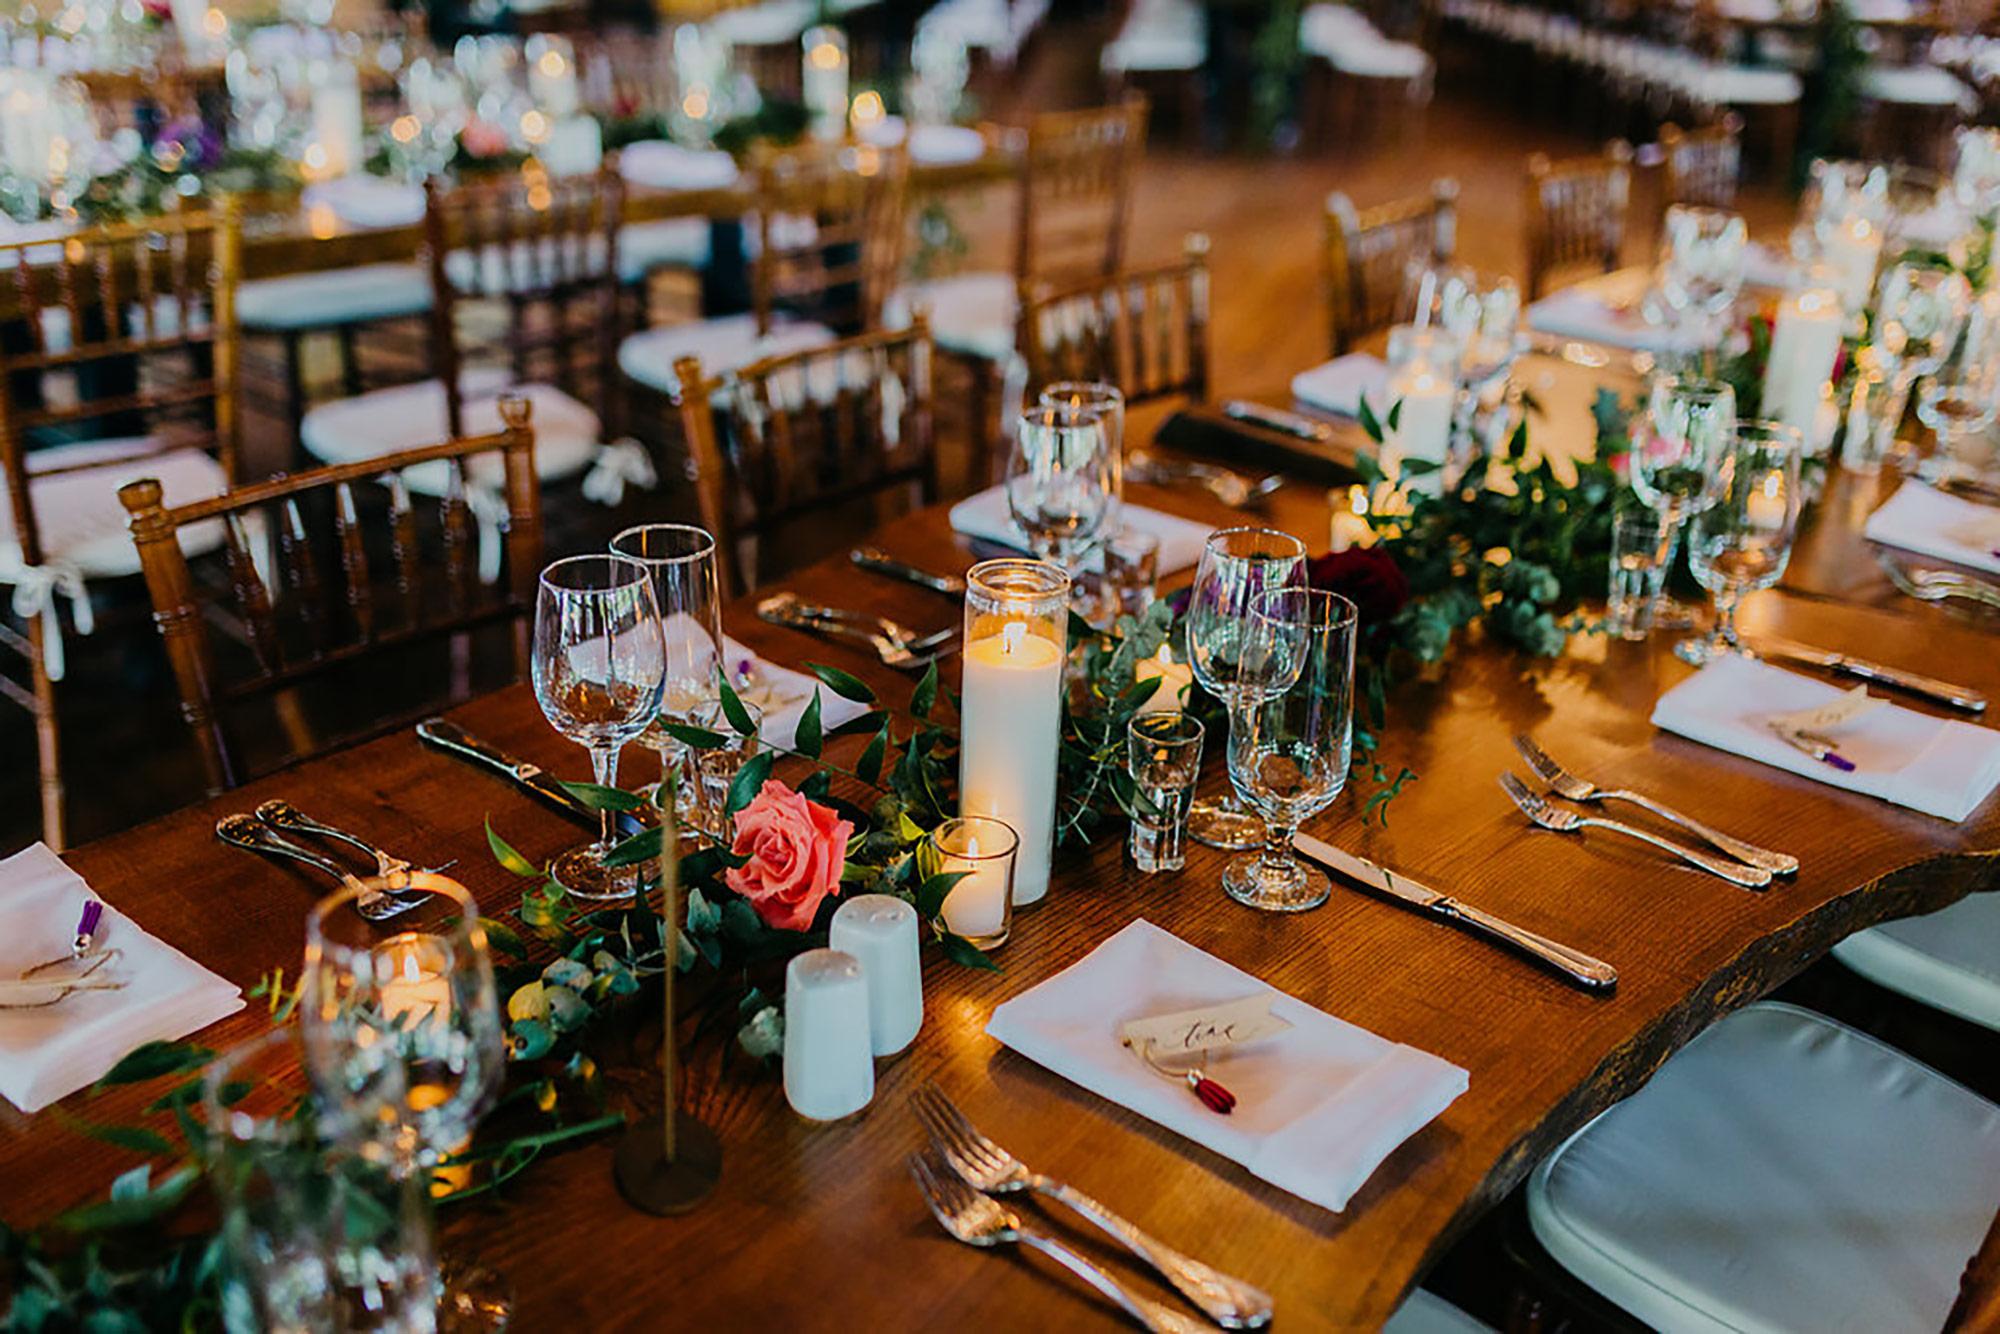 Kurtz-Orchards-Wedding-Niagara-wedding-Vineyard-Bride-Photography-by-Kayla-Rocca-034.JPG